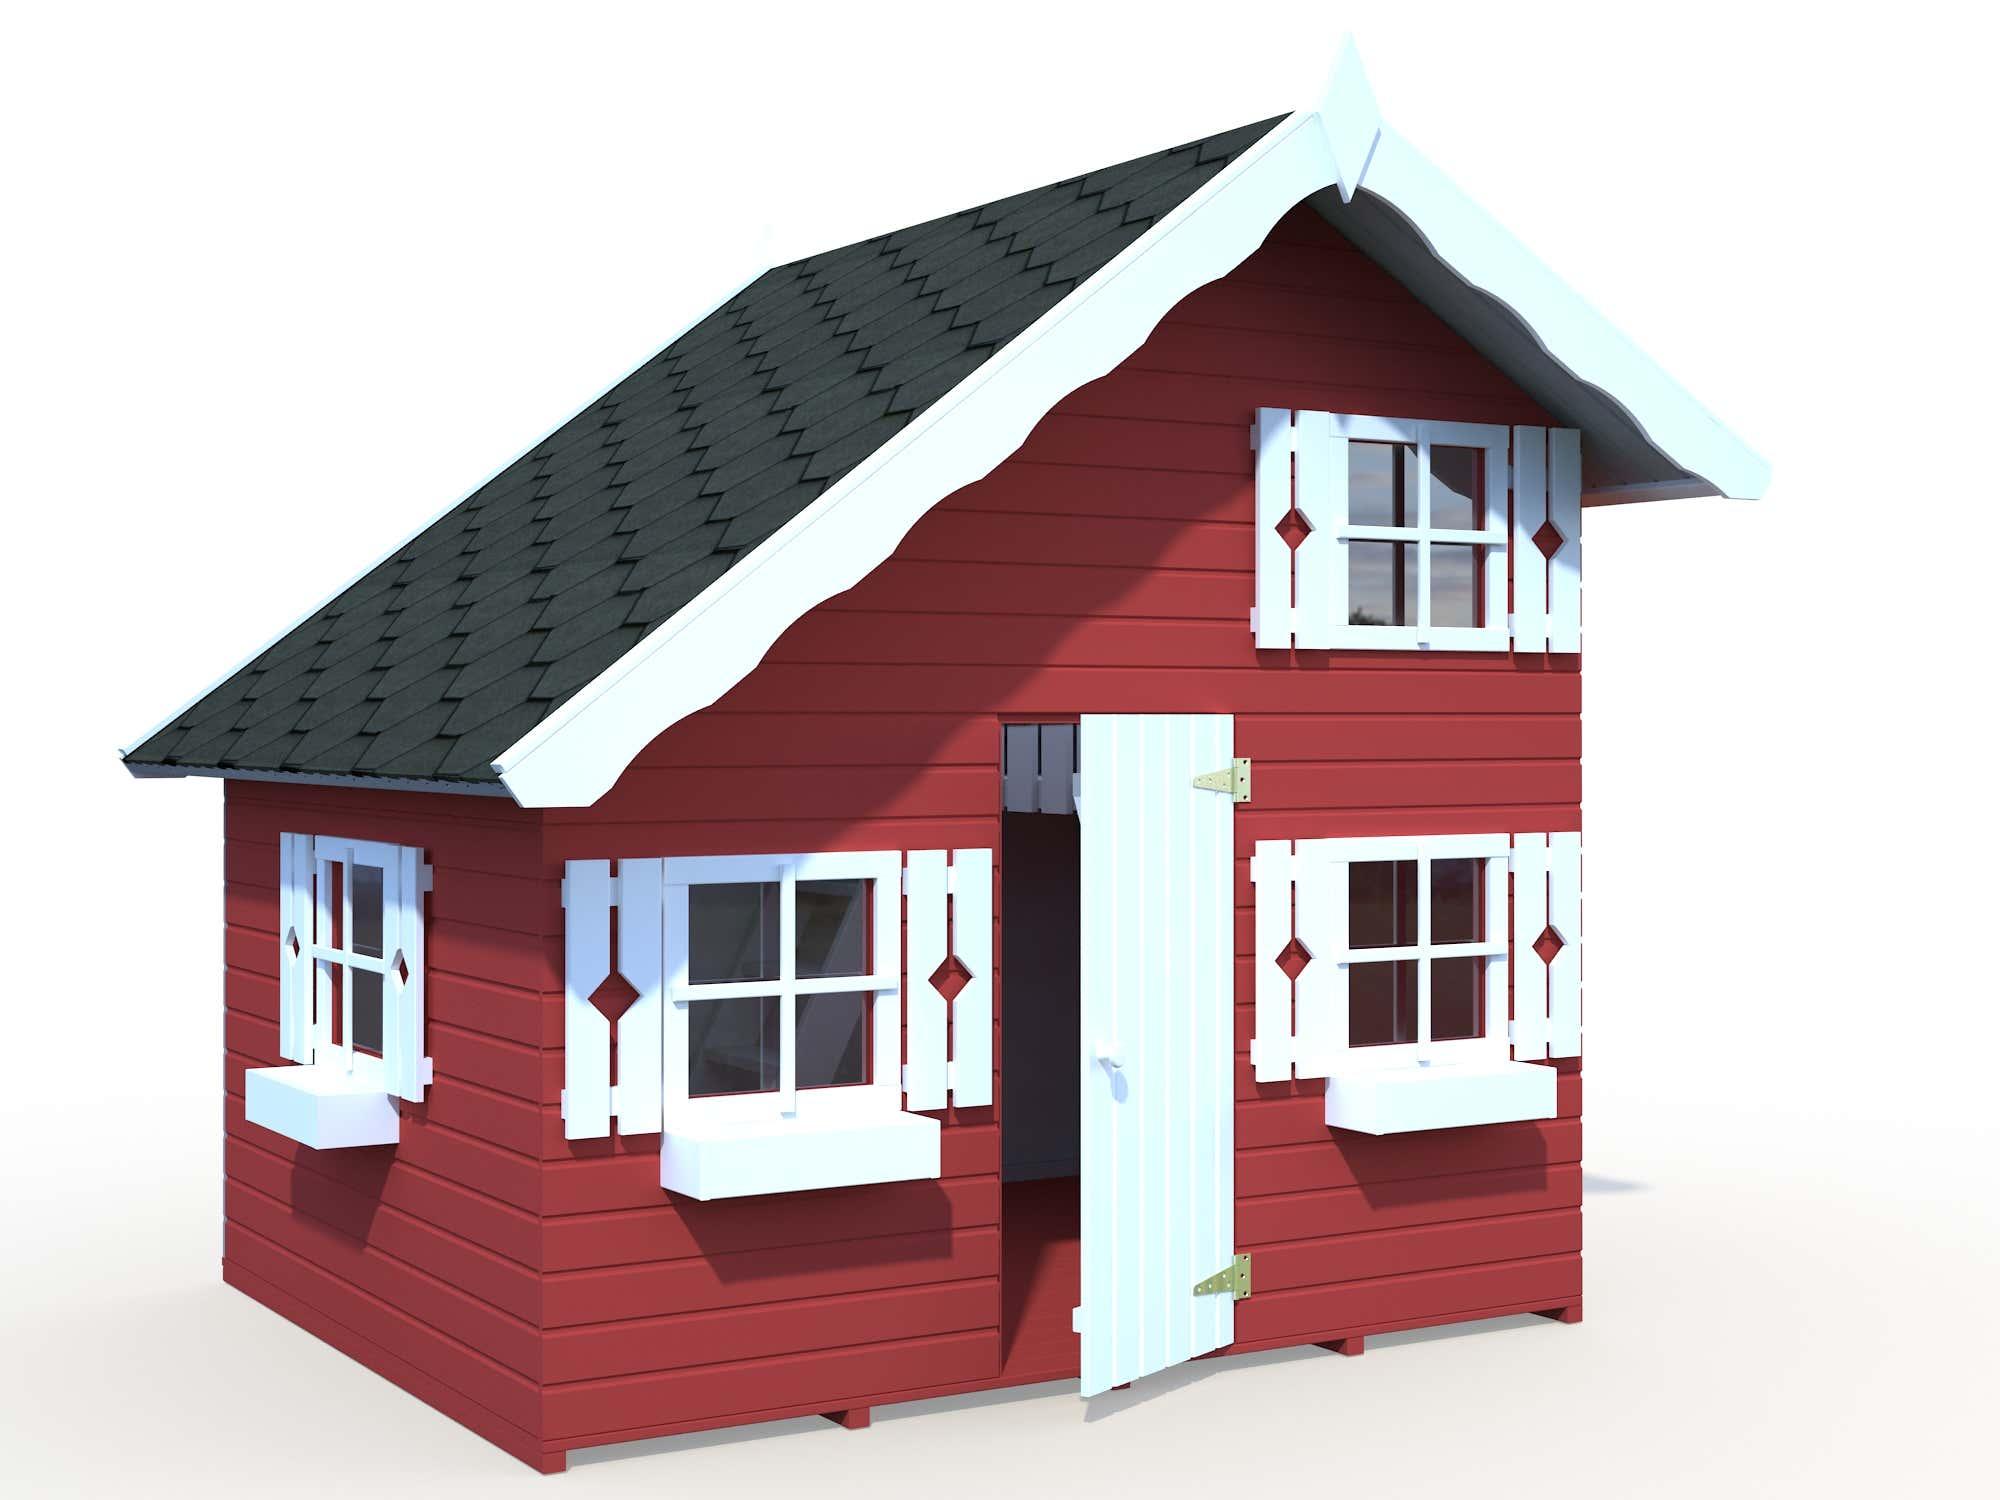 palmako kinderspielhaus tom elbd16 2218 a z gartenhaus gmbh. Black Bedroom Furniture Sets. Home Design Ideas